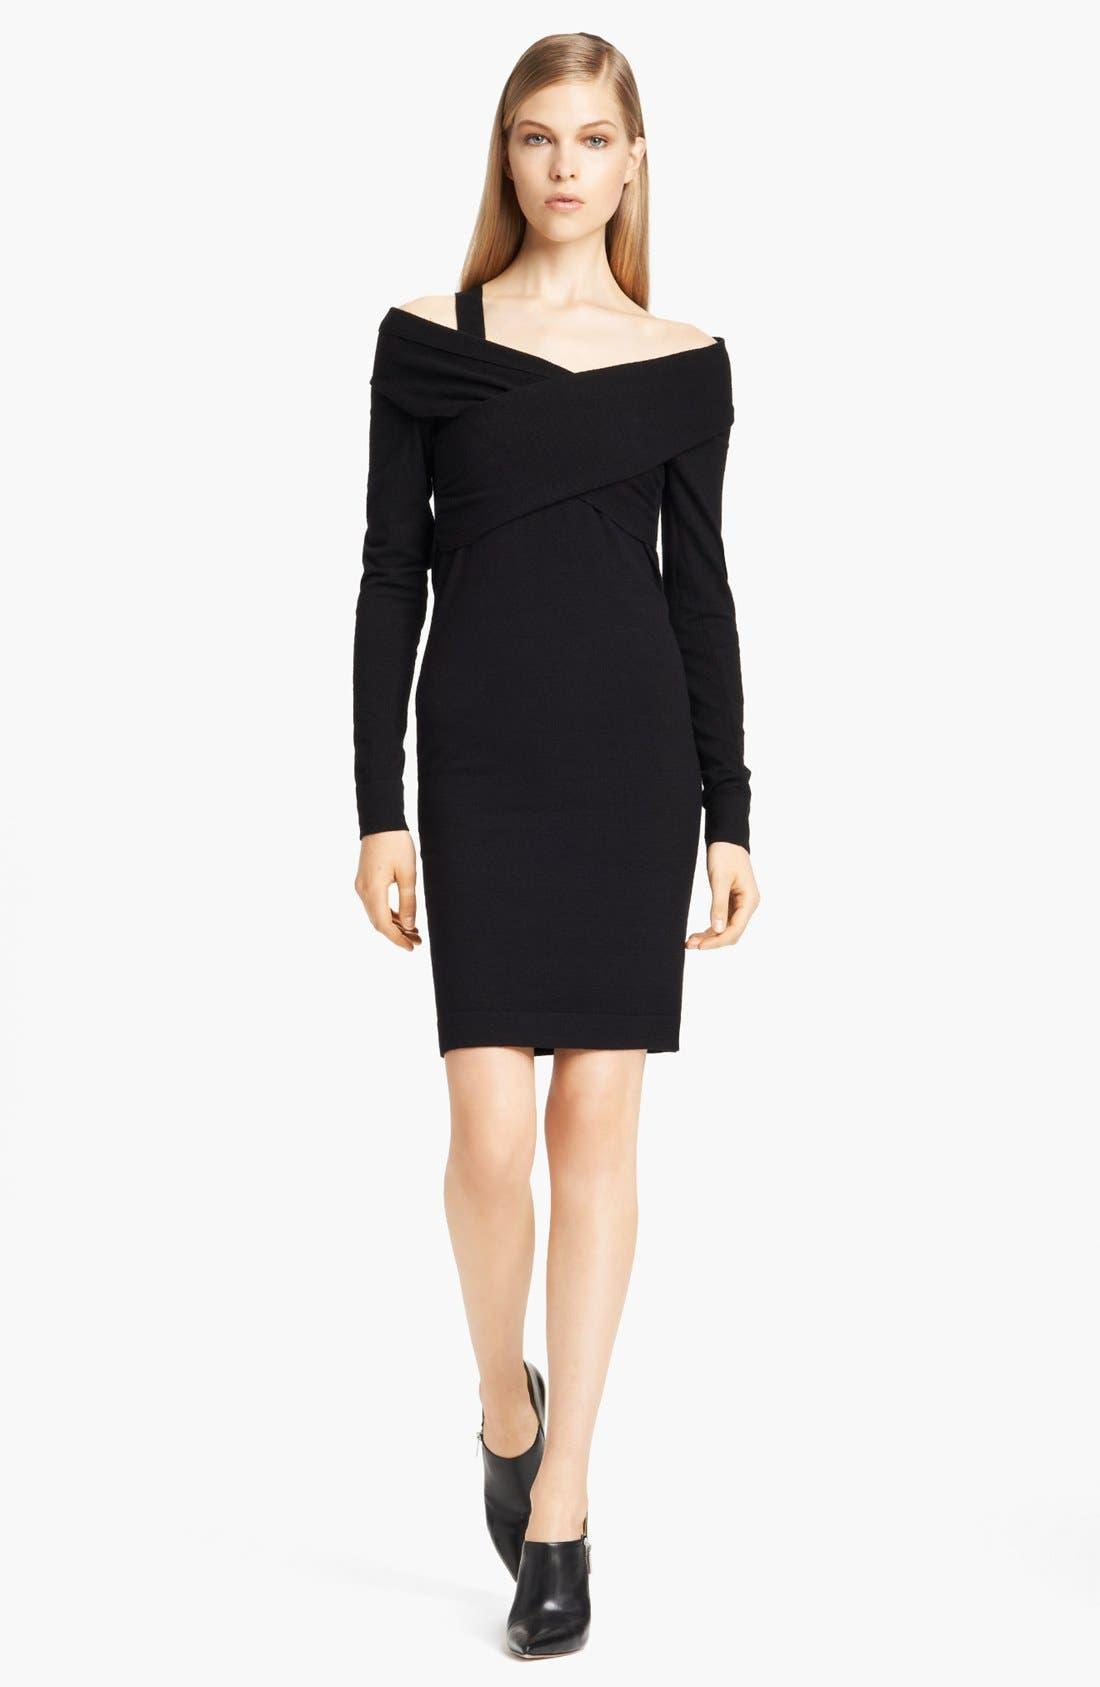 Alternate Image 1 Selected - Donna Karan Collection 'First Layer' Cashmere Blend Dress